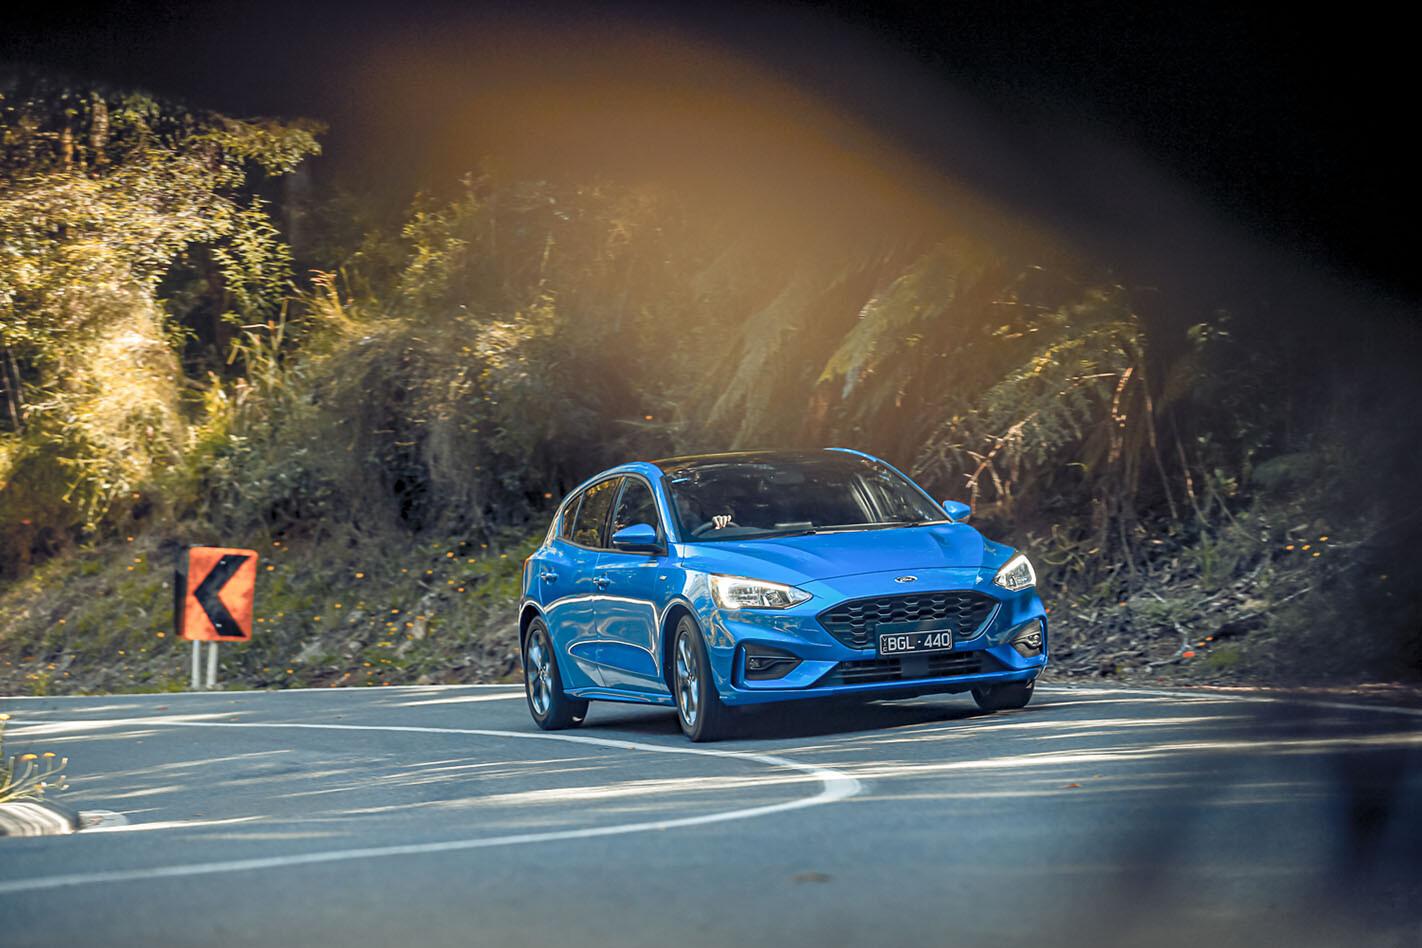 2021 Mazda 3 Skyactiv X v Ford Focus ST-Line v Hyundai i30 N-Line v Toyota Corolla ZR comparison